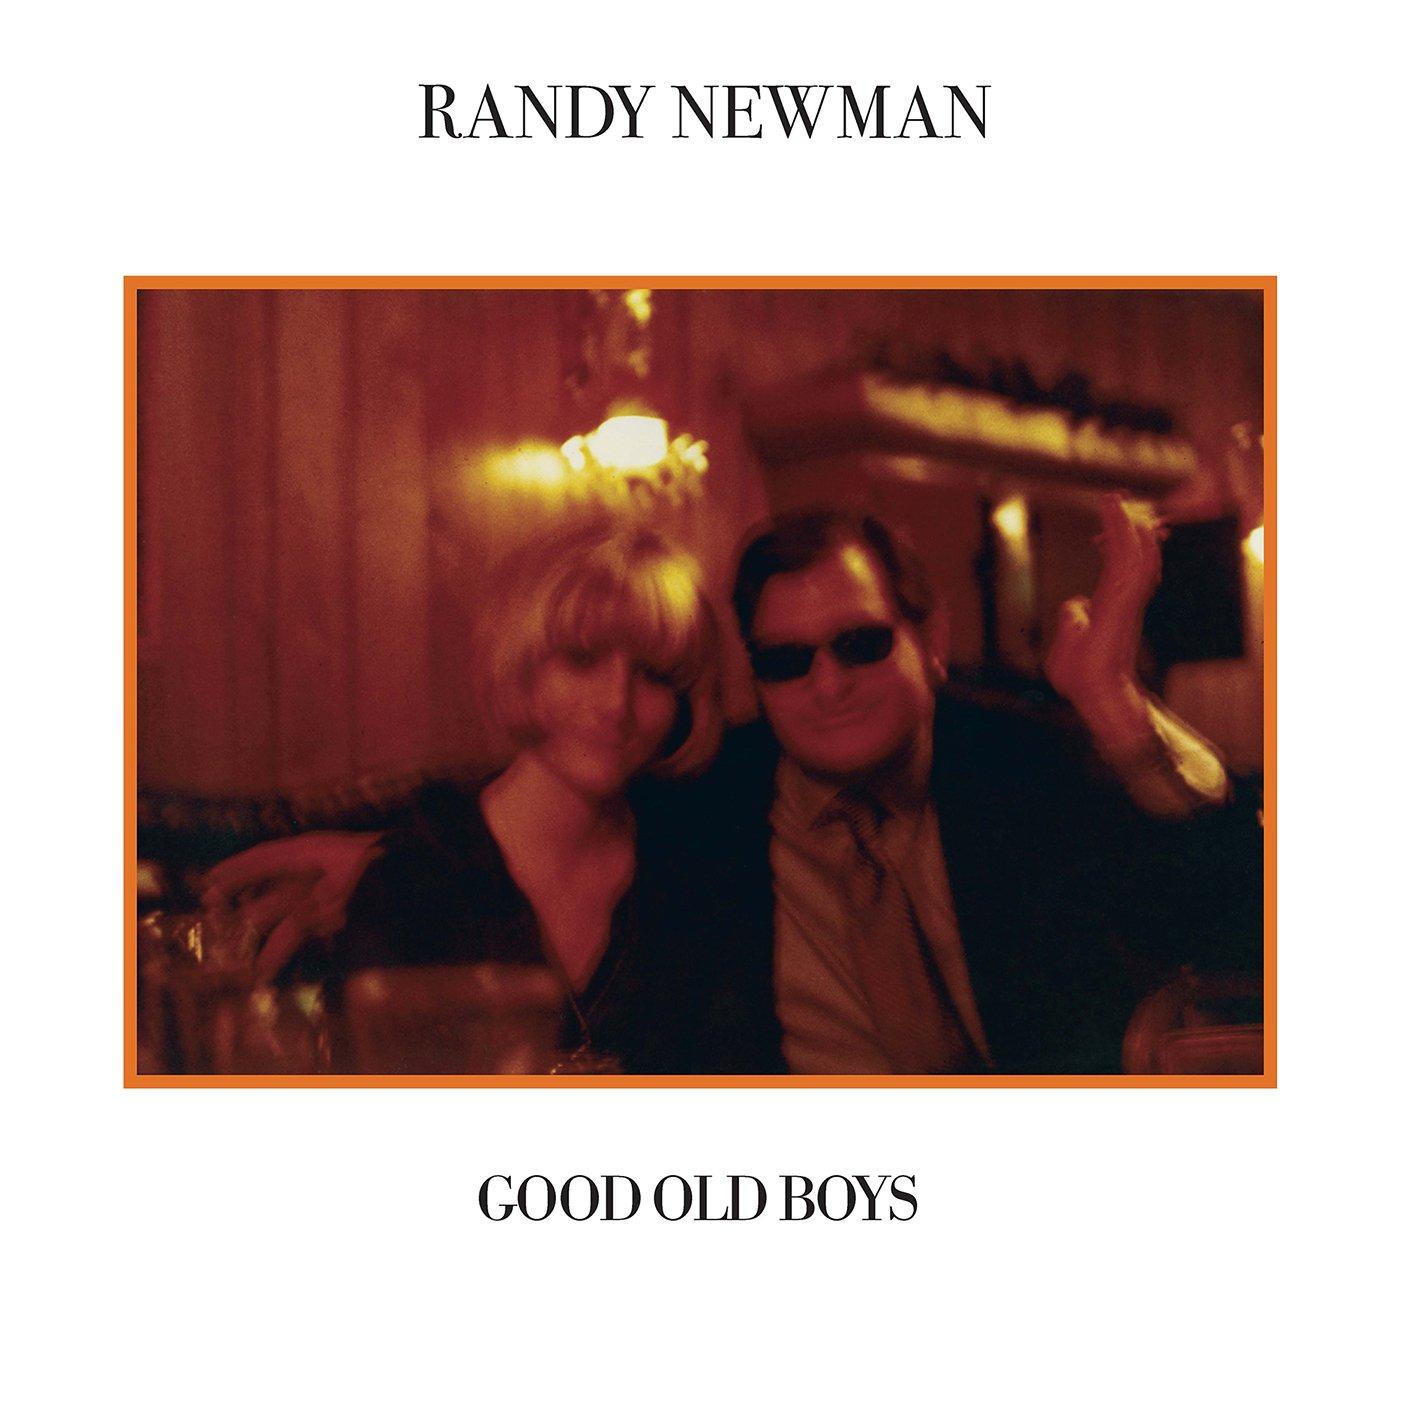 Randy Newman - Good Old Boys (Vinyl) - Amazon.com Music